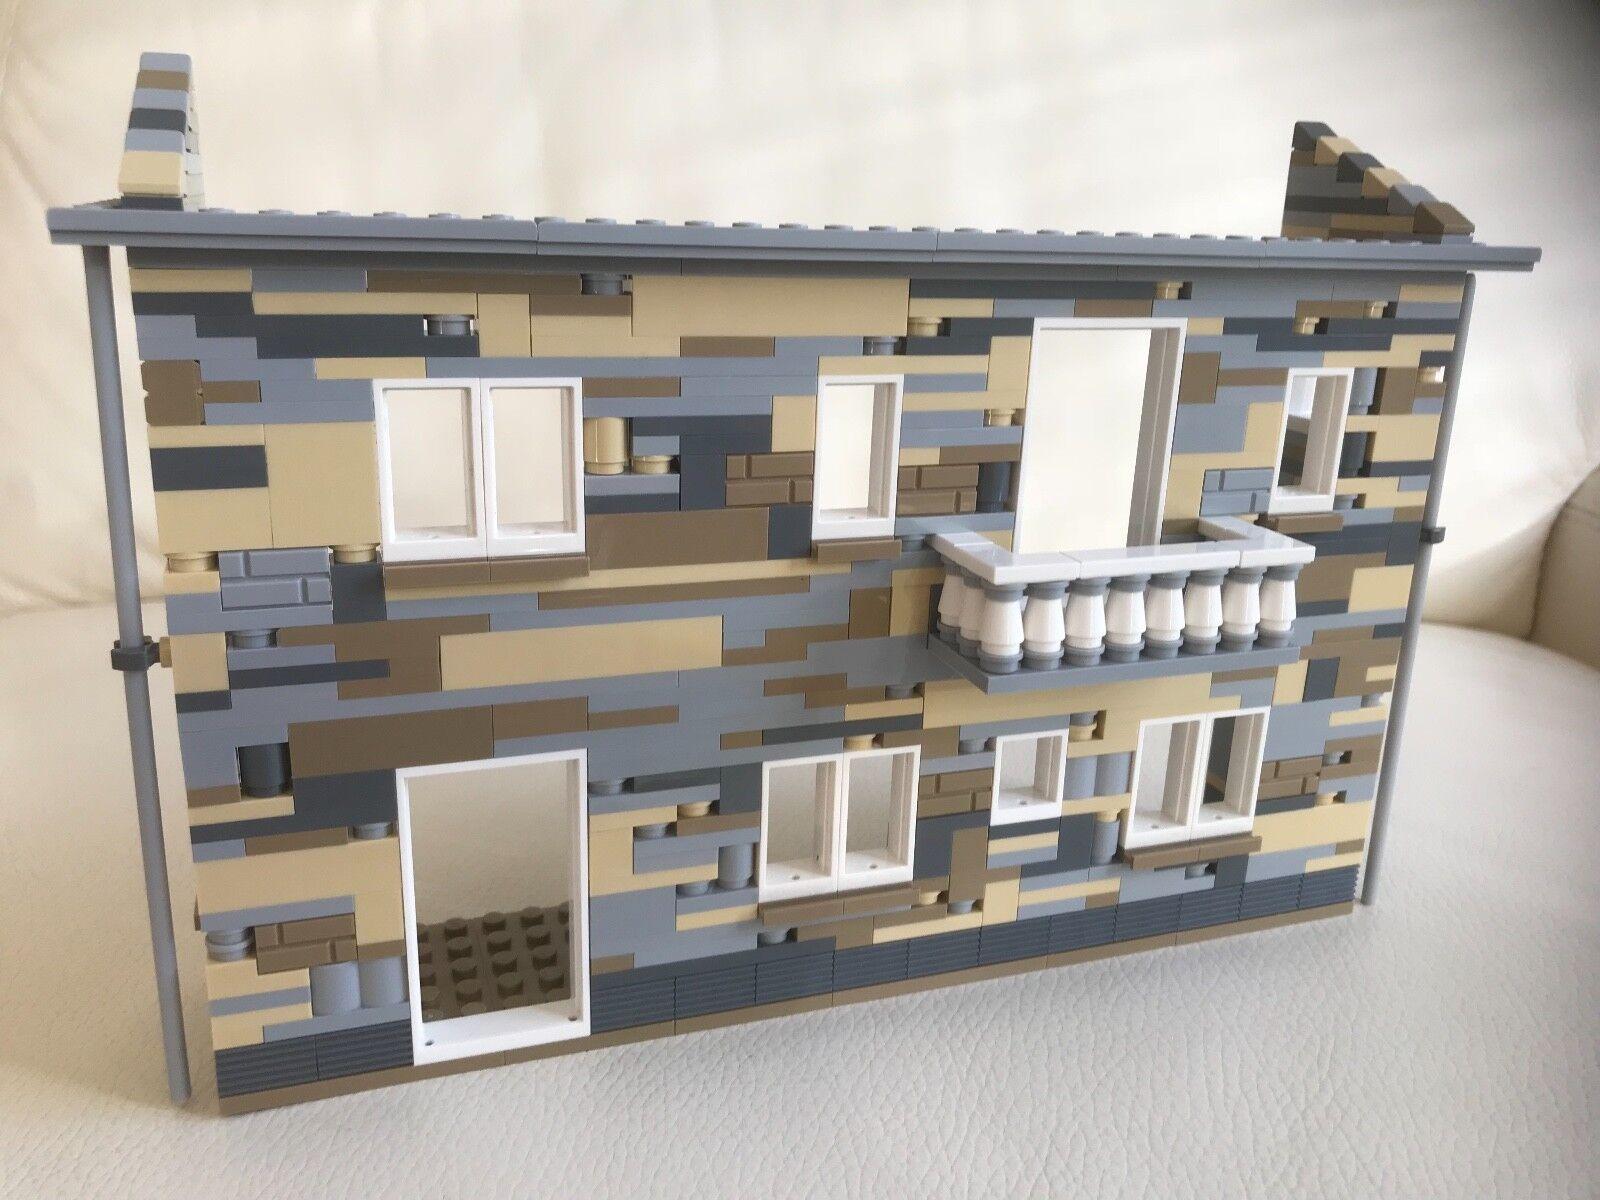 LEGO original parts - EUROPEAN TOWN BUILDING playable solid DIORAMA my design 73